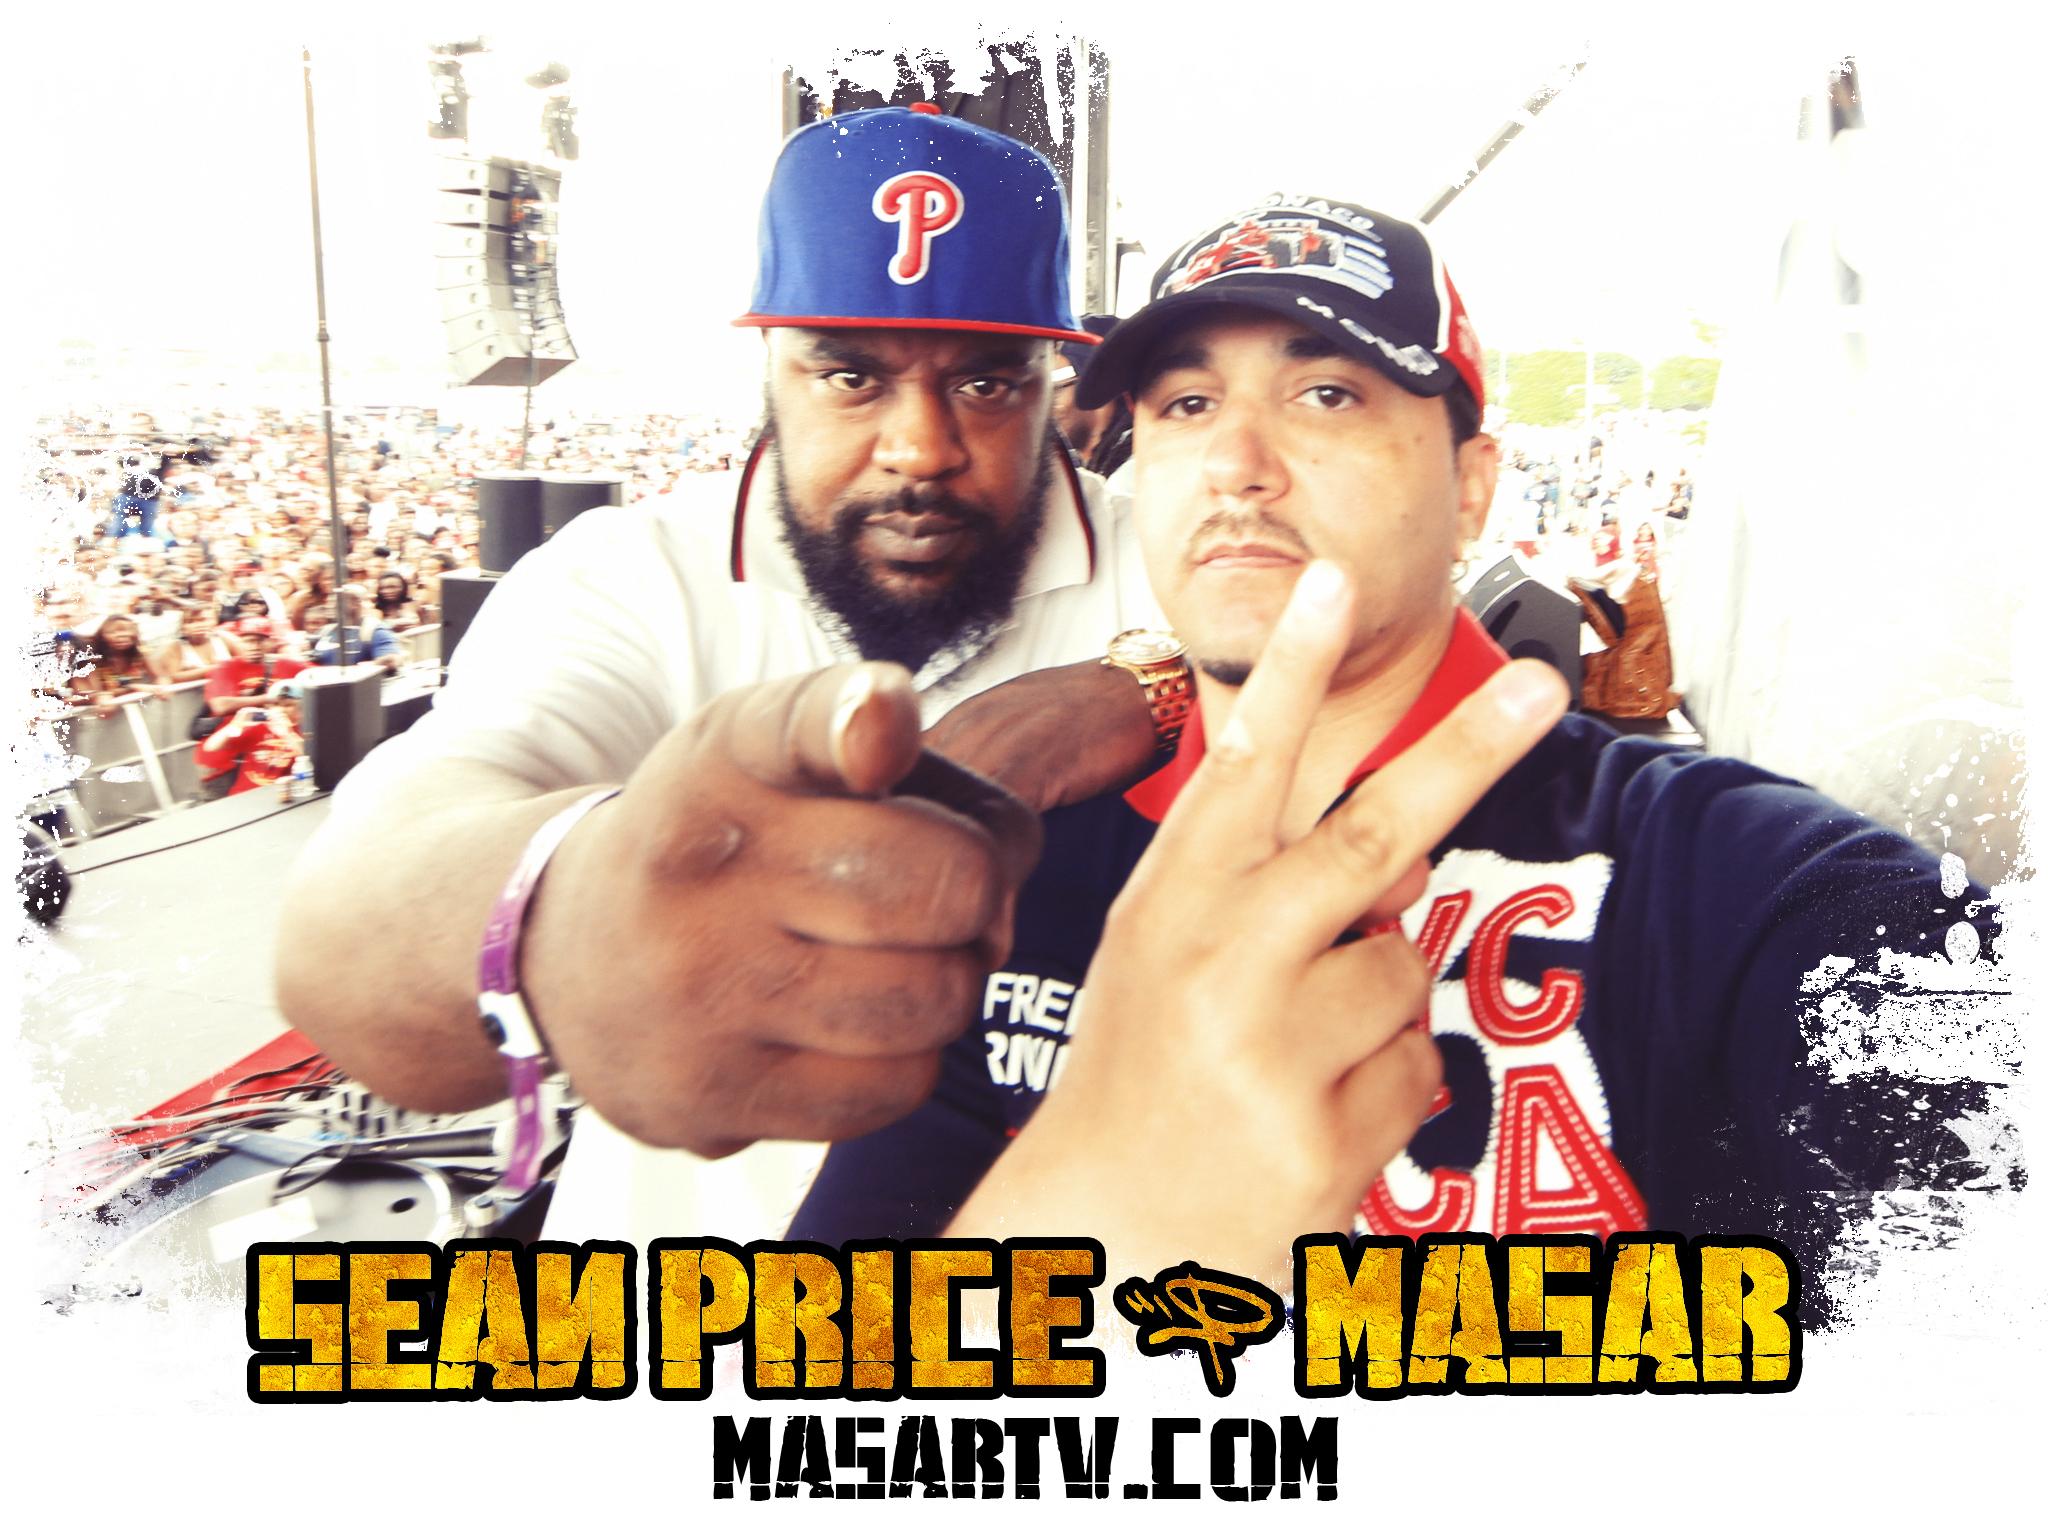 Masar & Sean Price